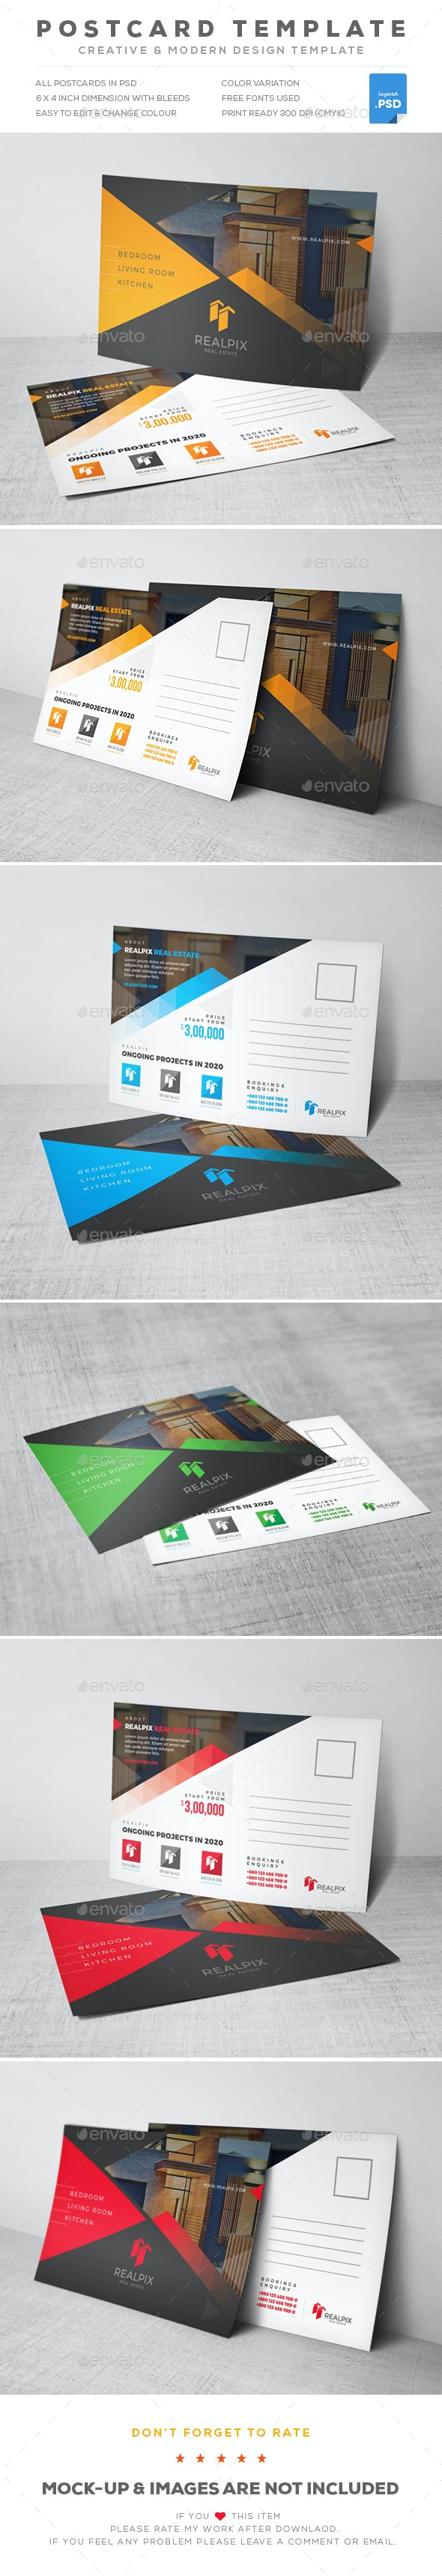 Real Estate Postcard - Cards & Invites Print Templates